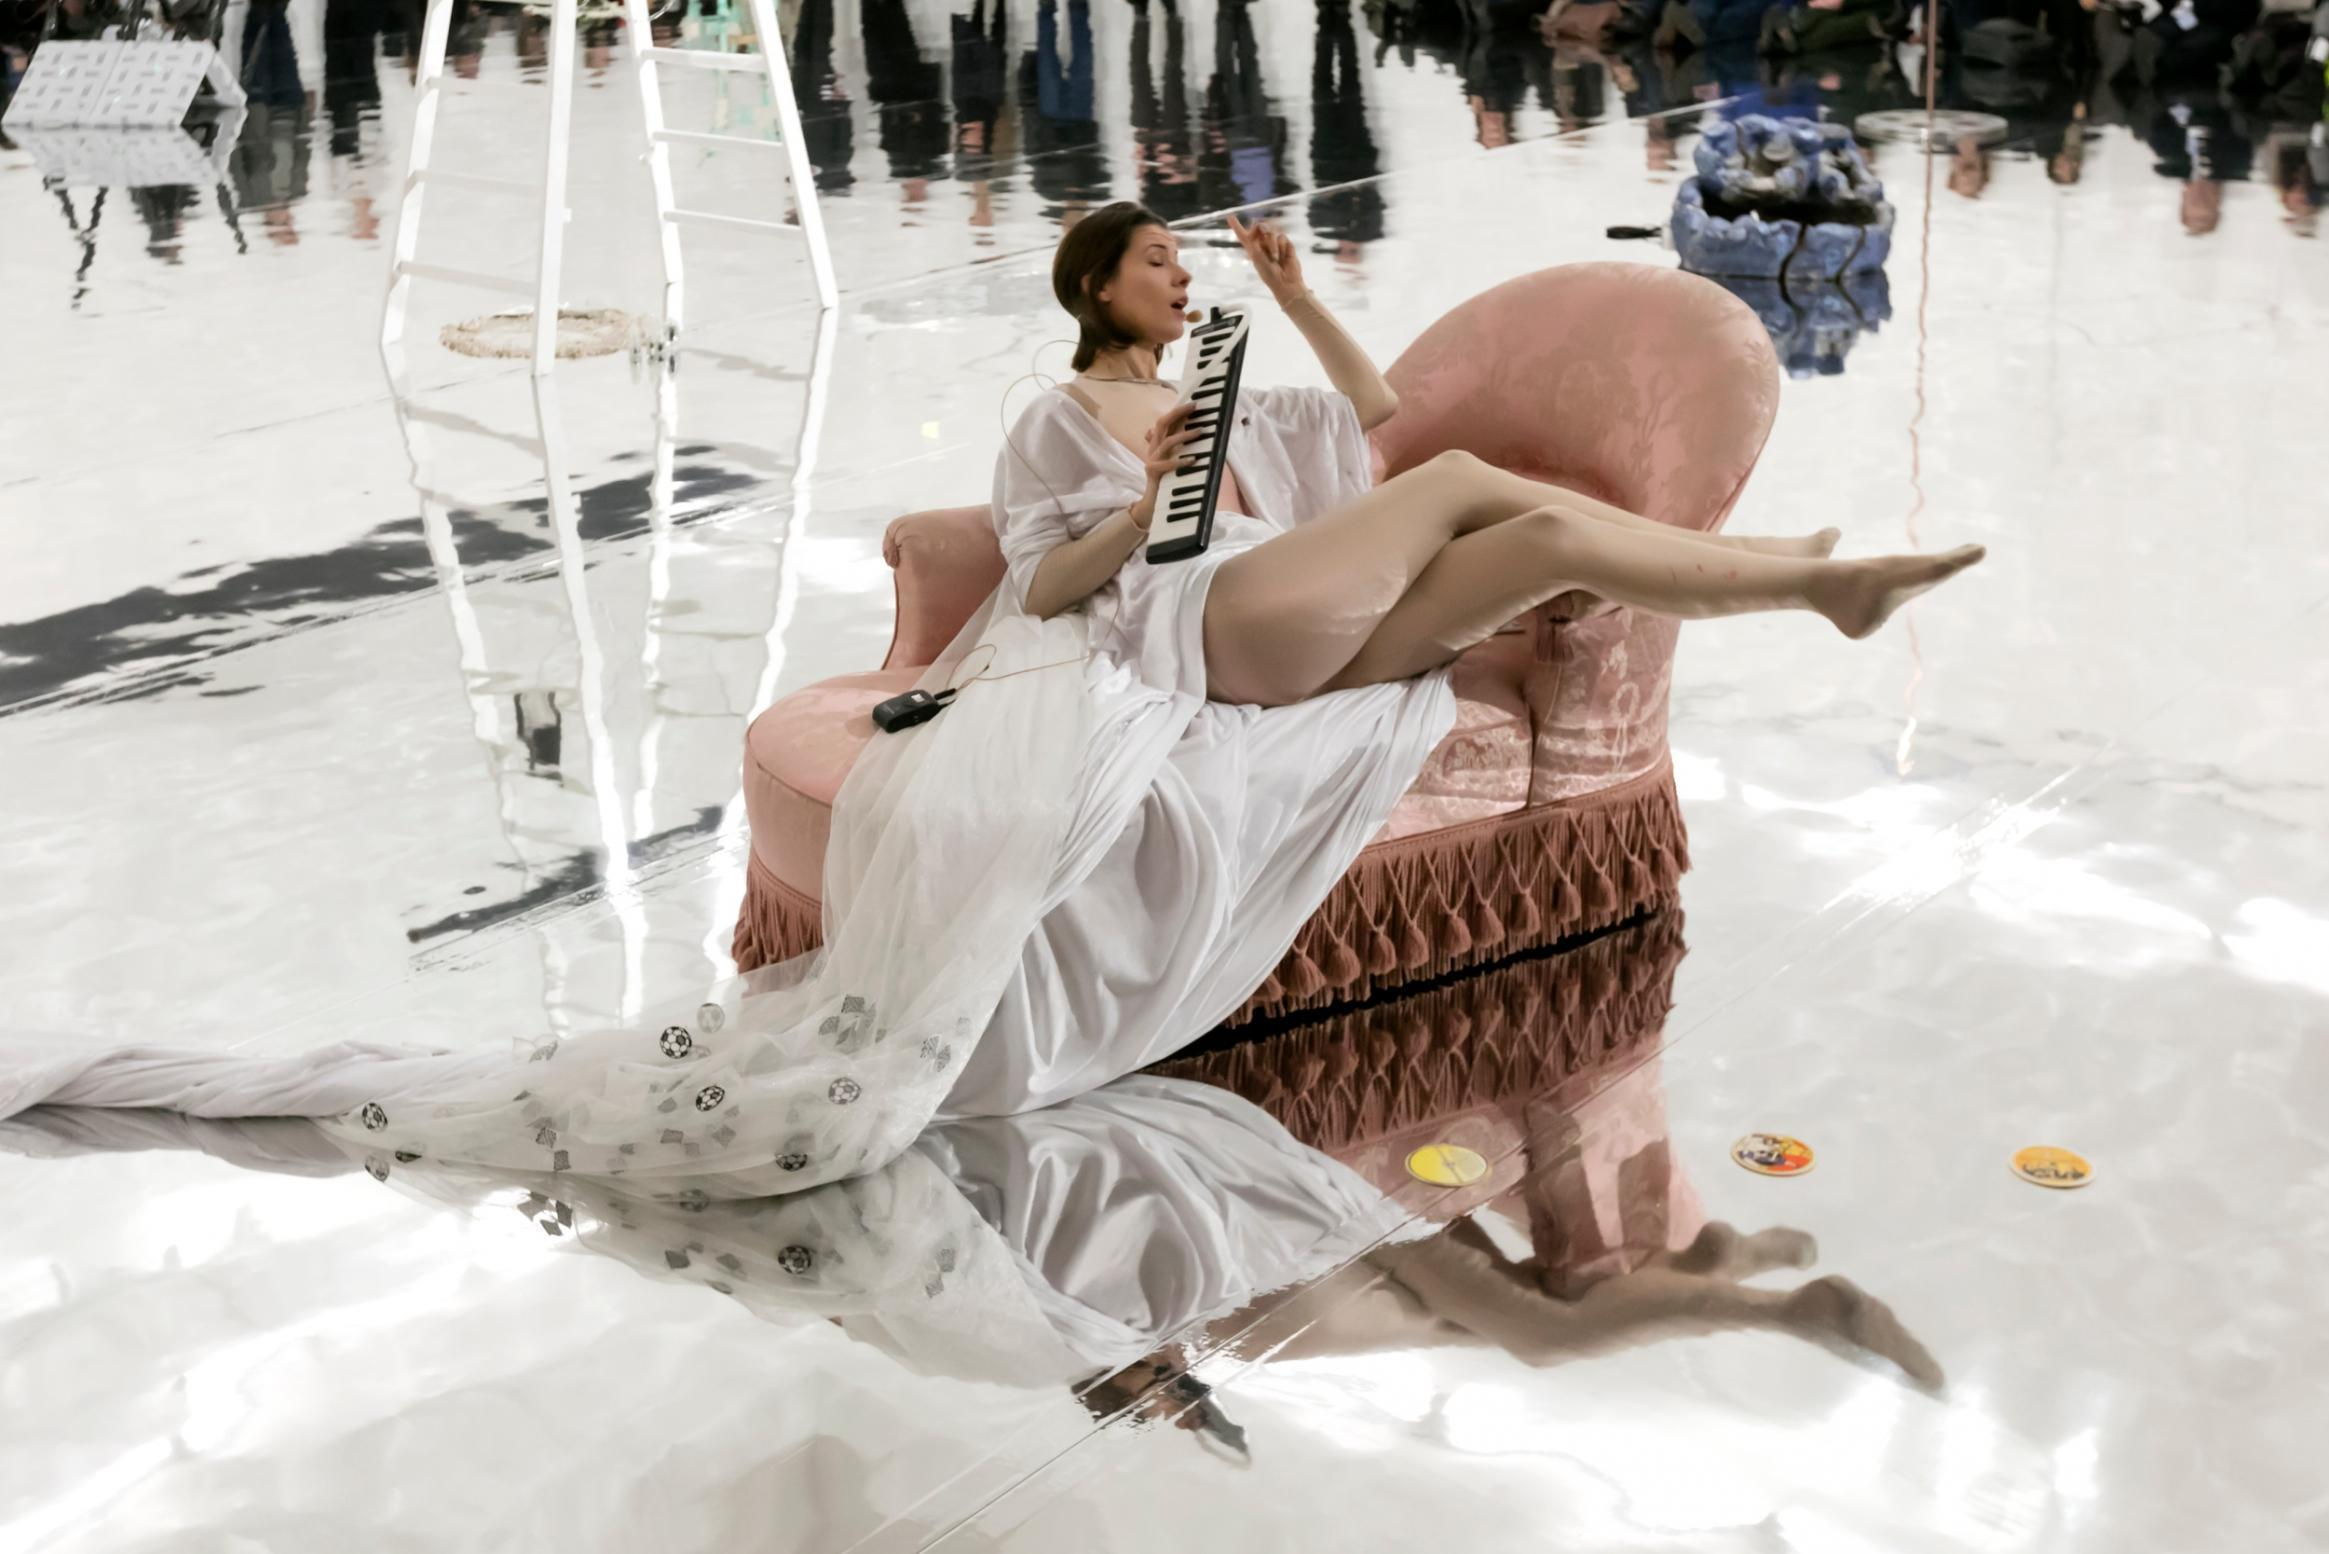 Sophie Jung The Bigger Sleep 2019 courtesy the artist and Kunstmuseum Basel Photo Julian Salinas